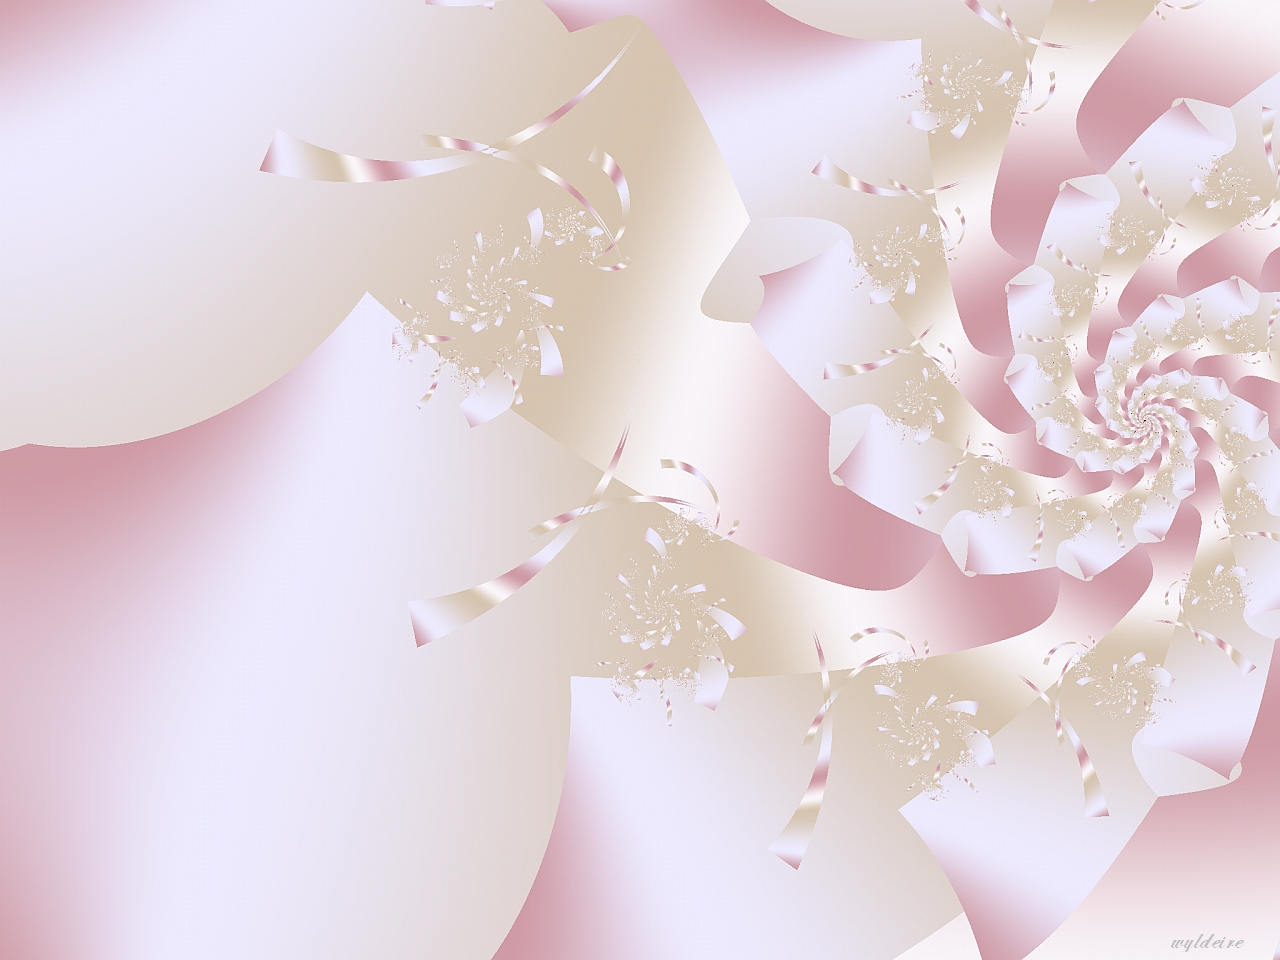 pretty in pink wallpaper by wyldeire customization wallpaper fractals 1280x960